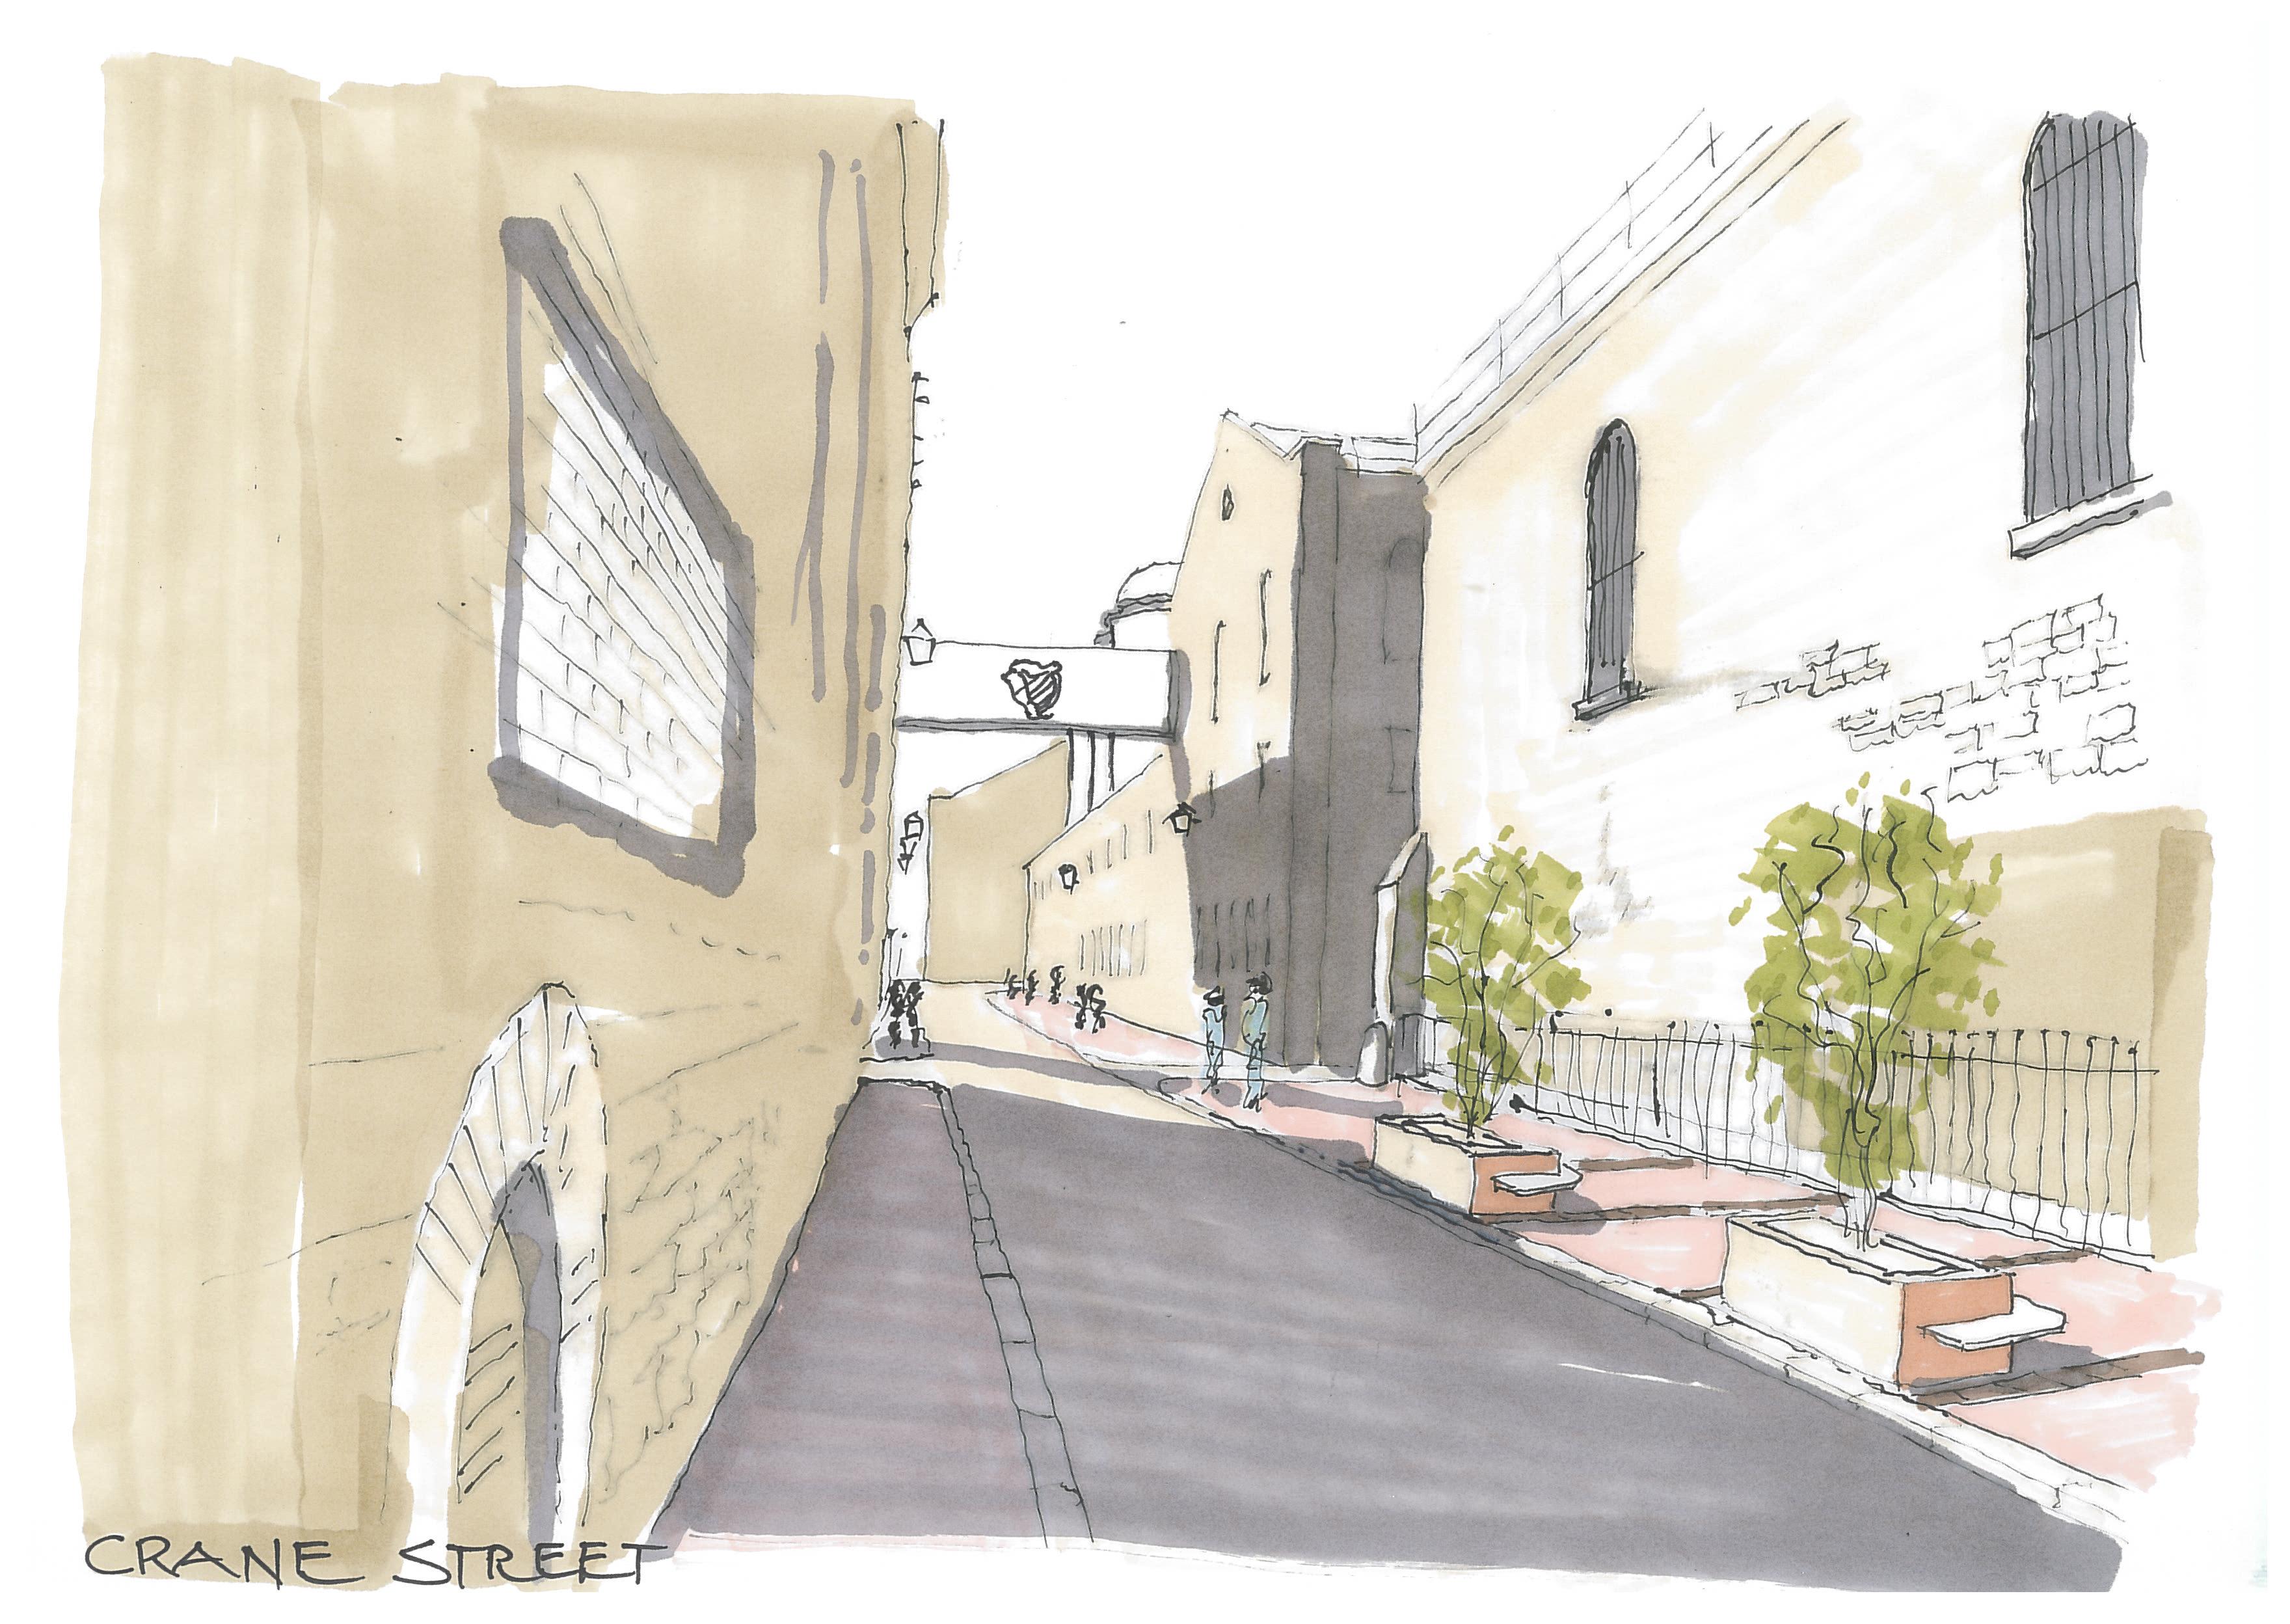 Crane Street Sketch View